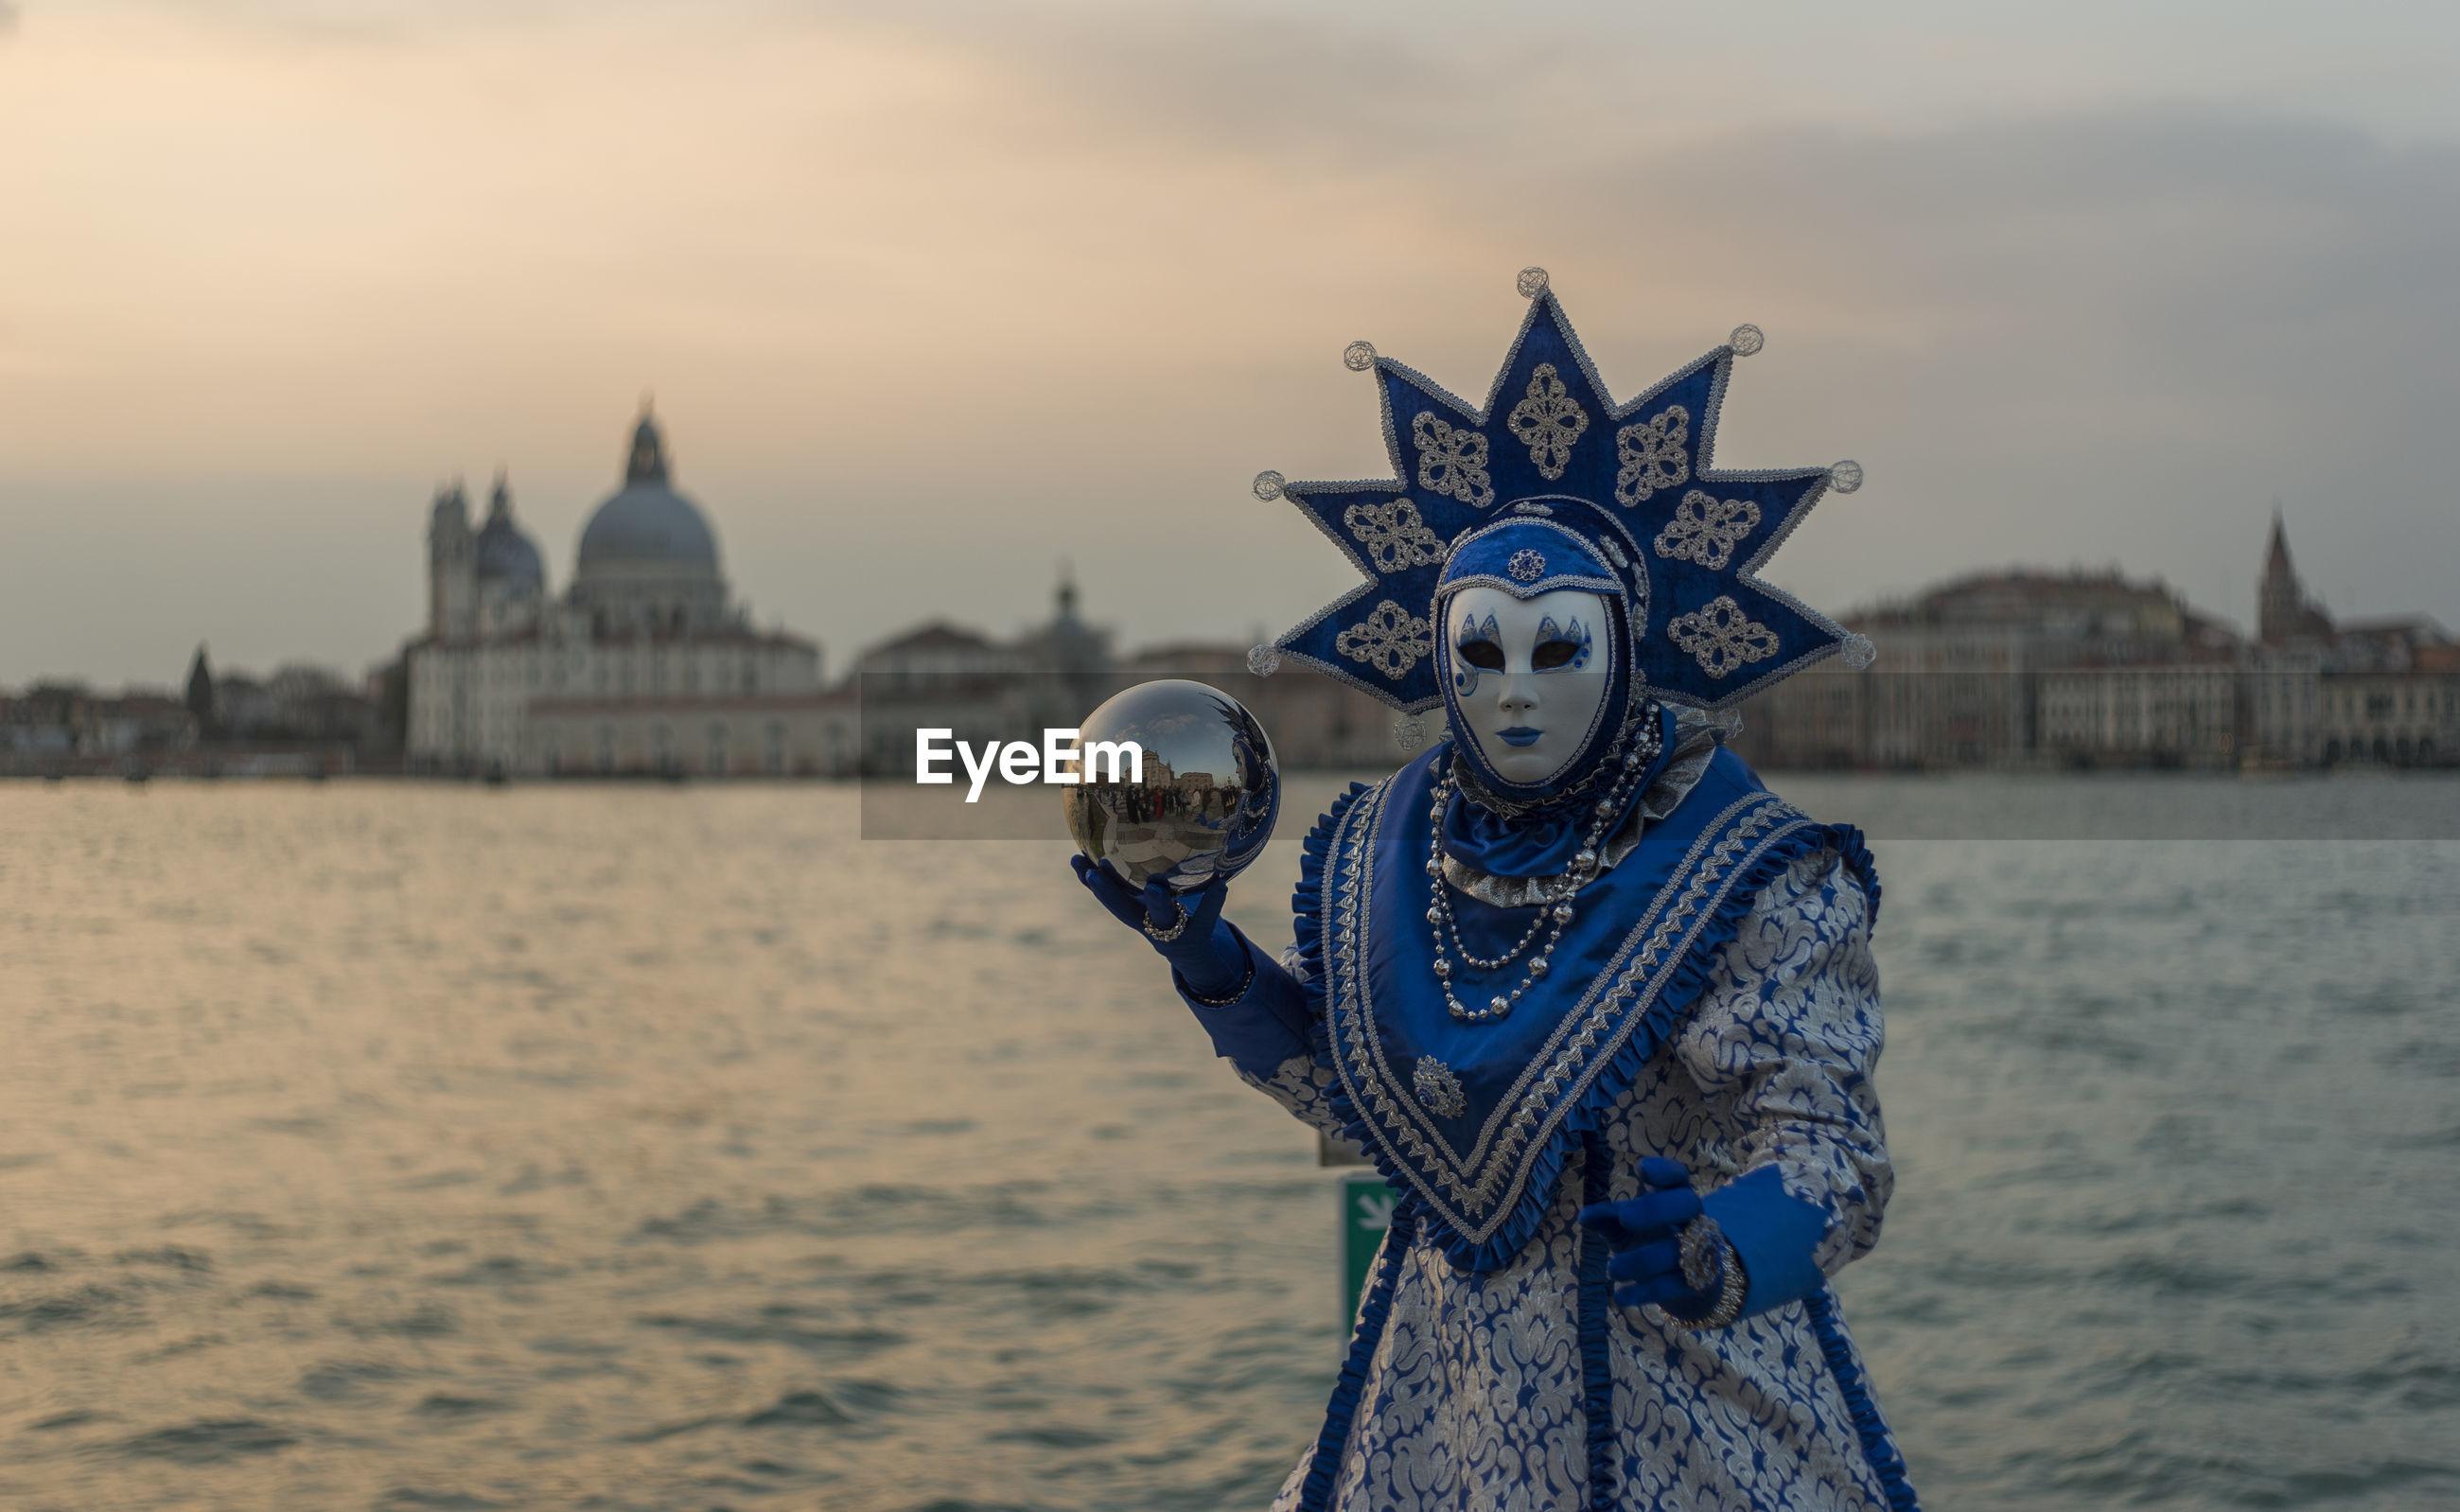 Carnival mask against sky during sunset venice